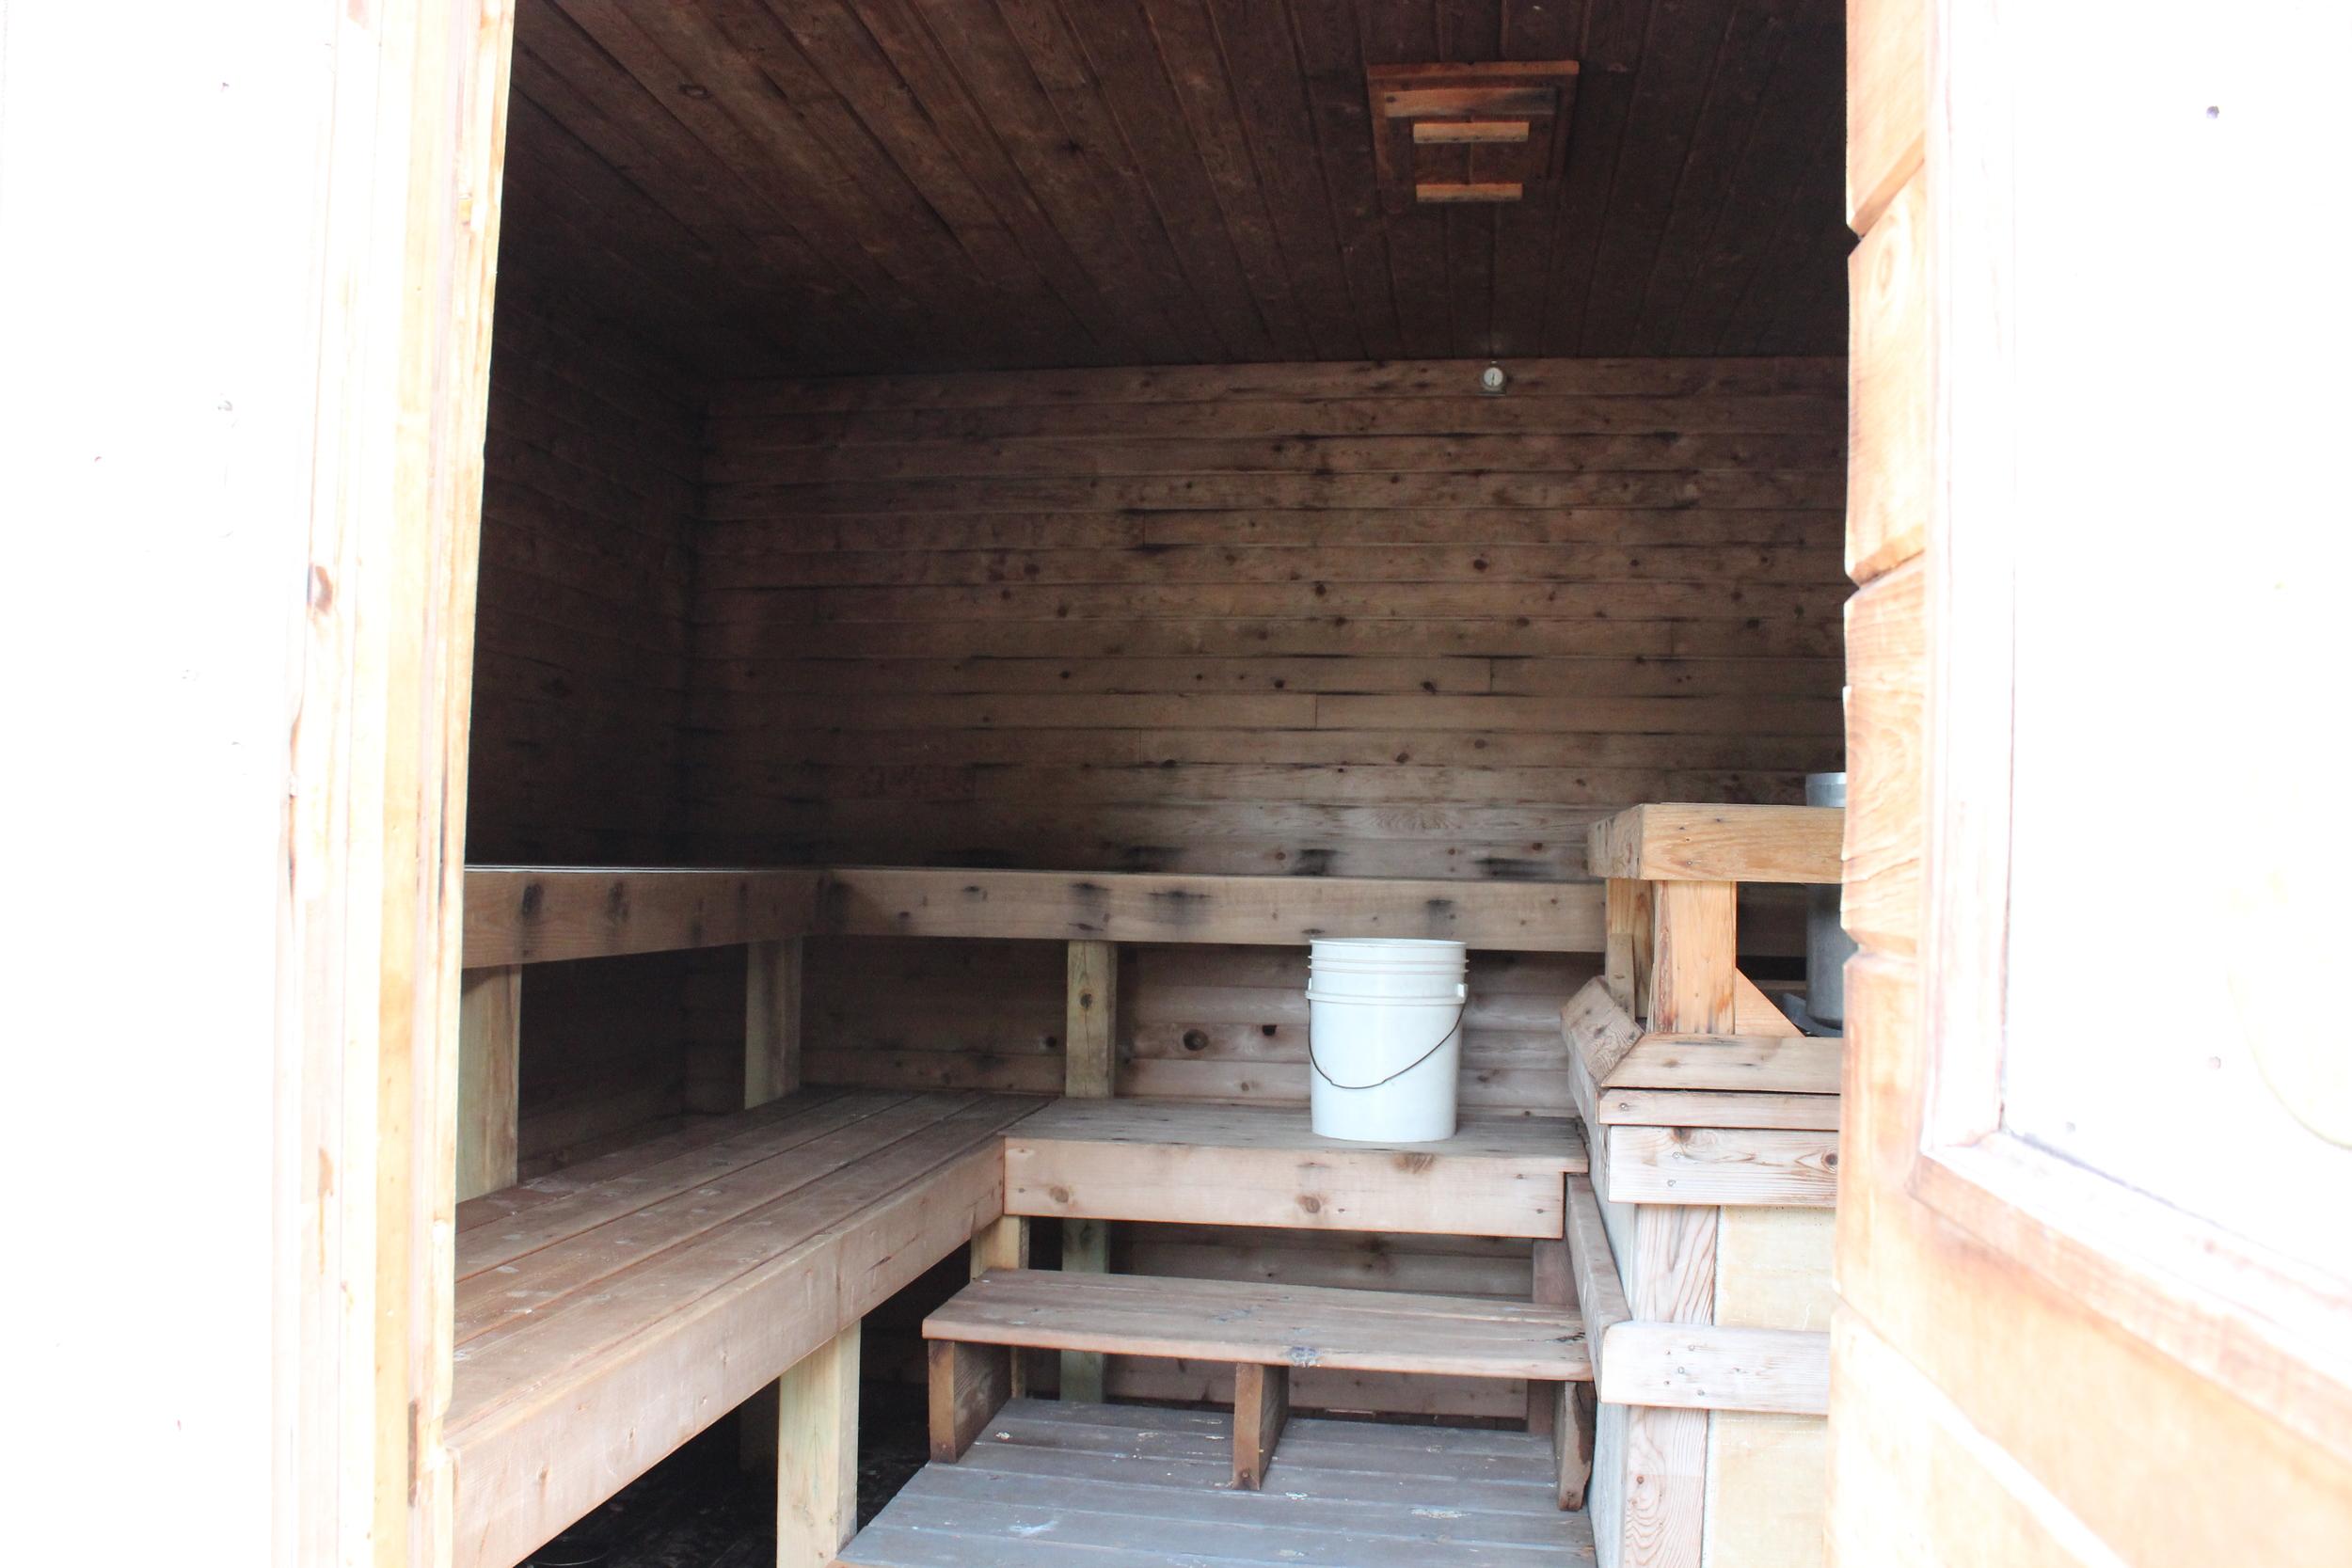 Inside of Sauna